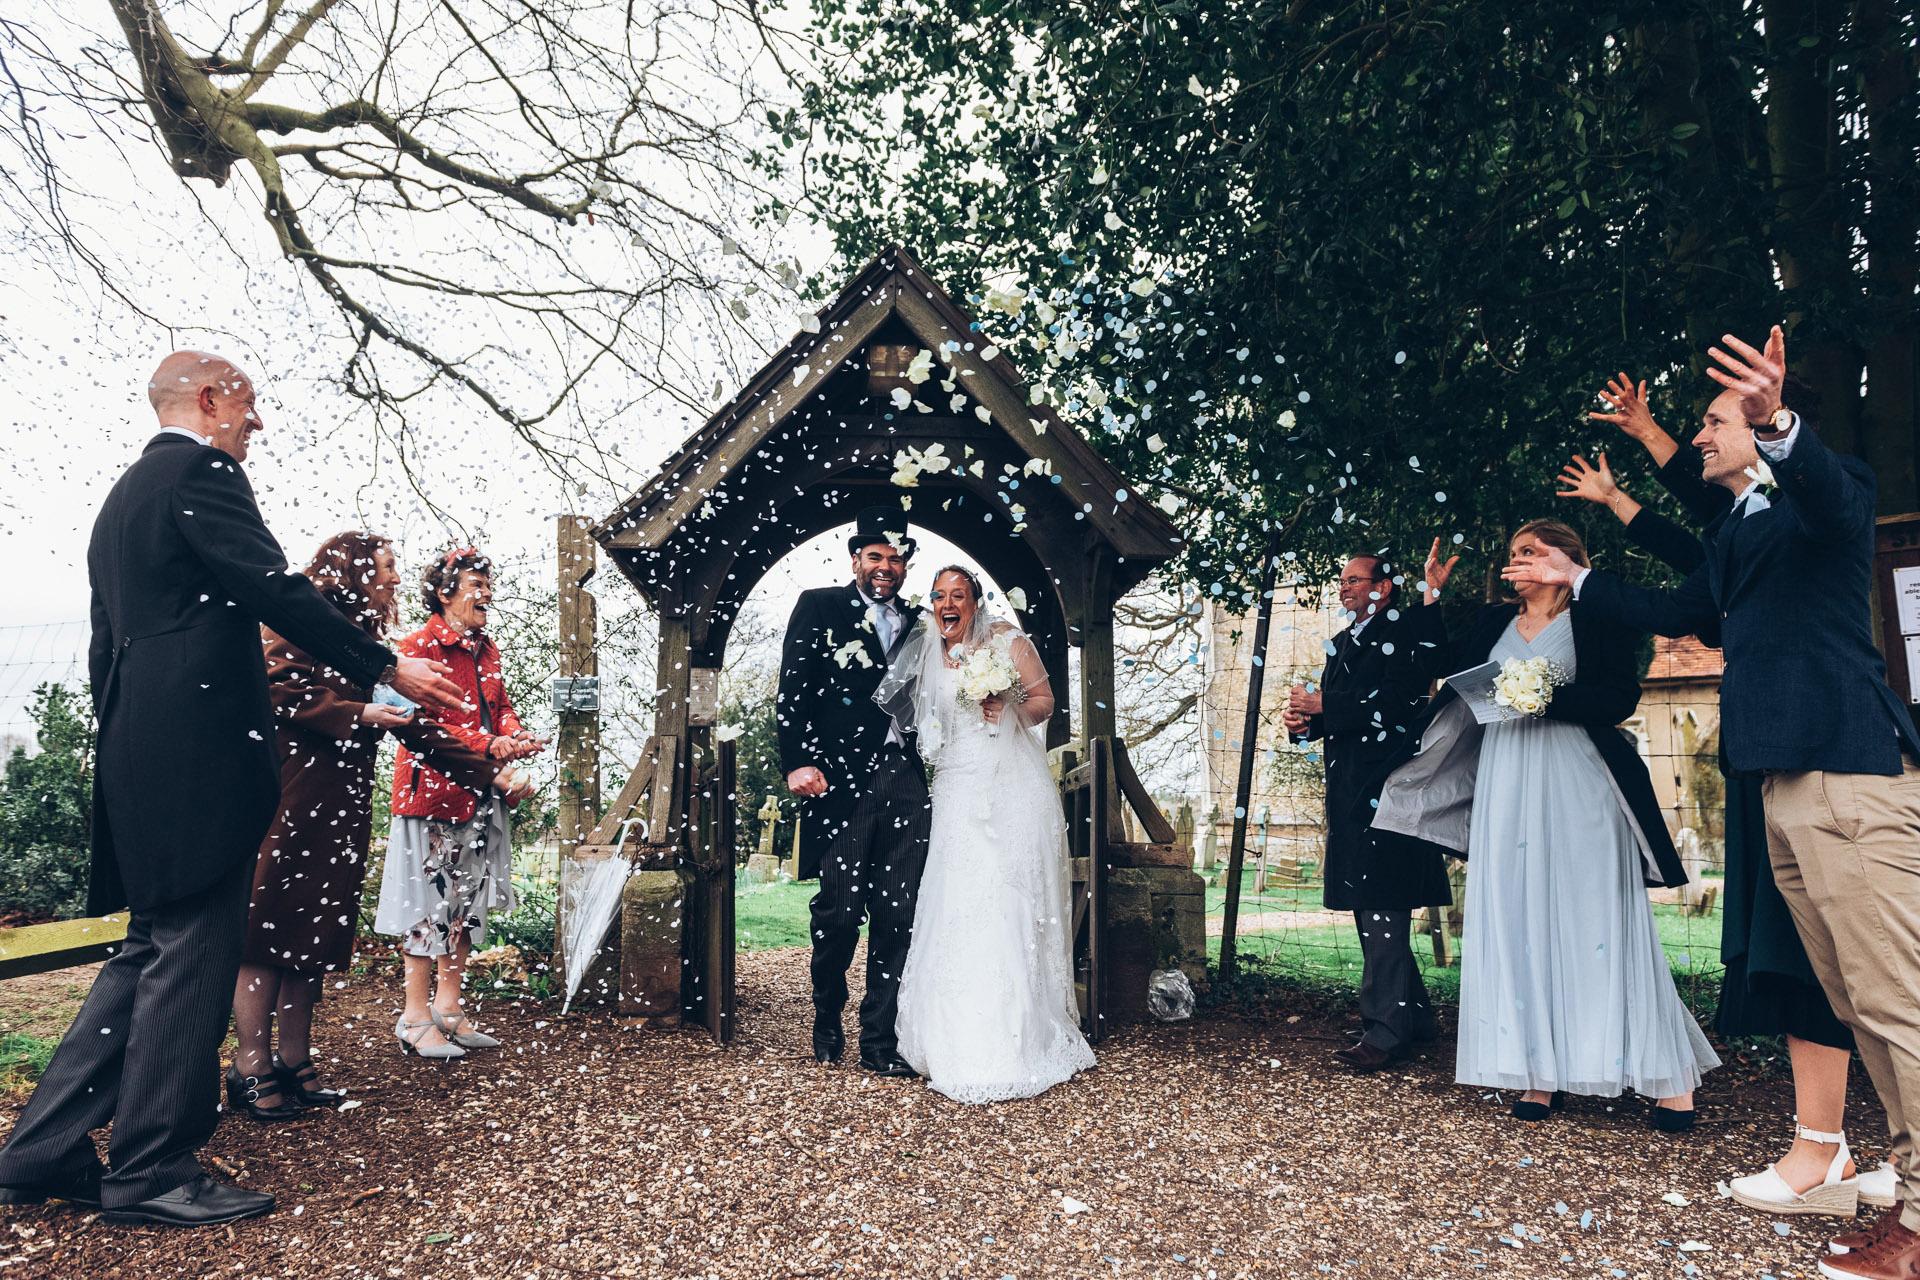 46 Small weddings Hertfordshire